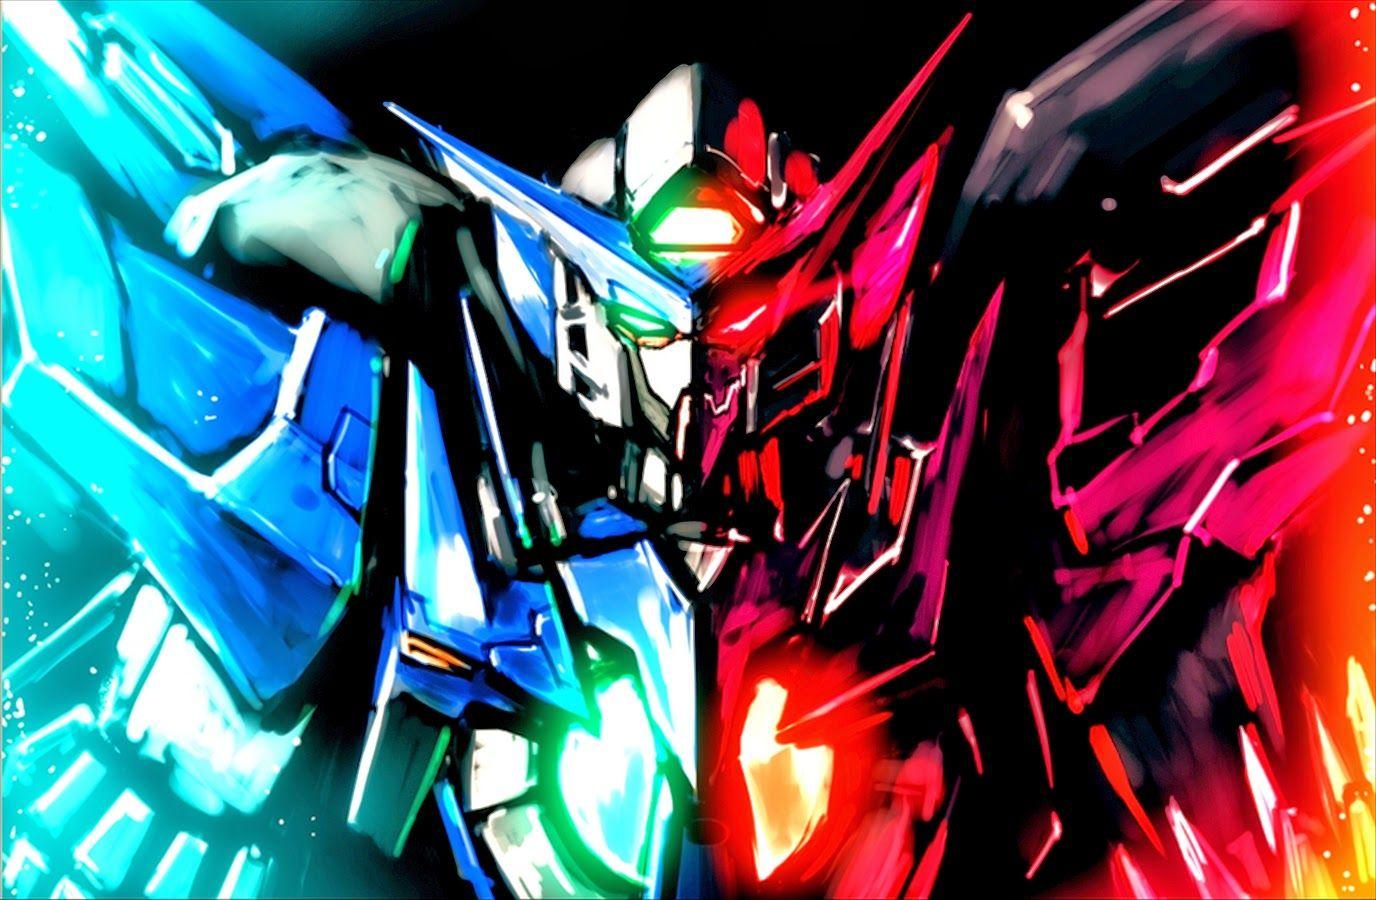 Gundam Exia Dark Matter Wallpaper Poster Image Fanmade Gundam Exia Gundam Gundam Wallpapers